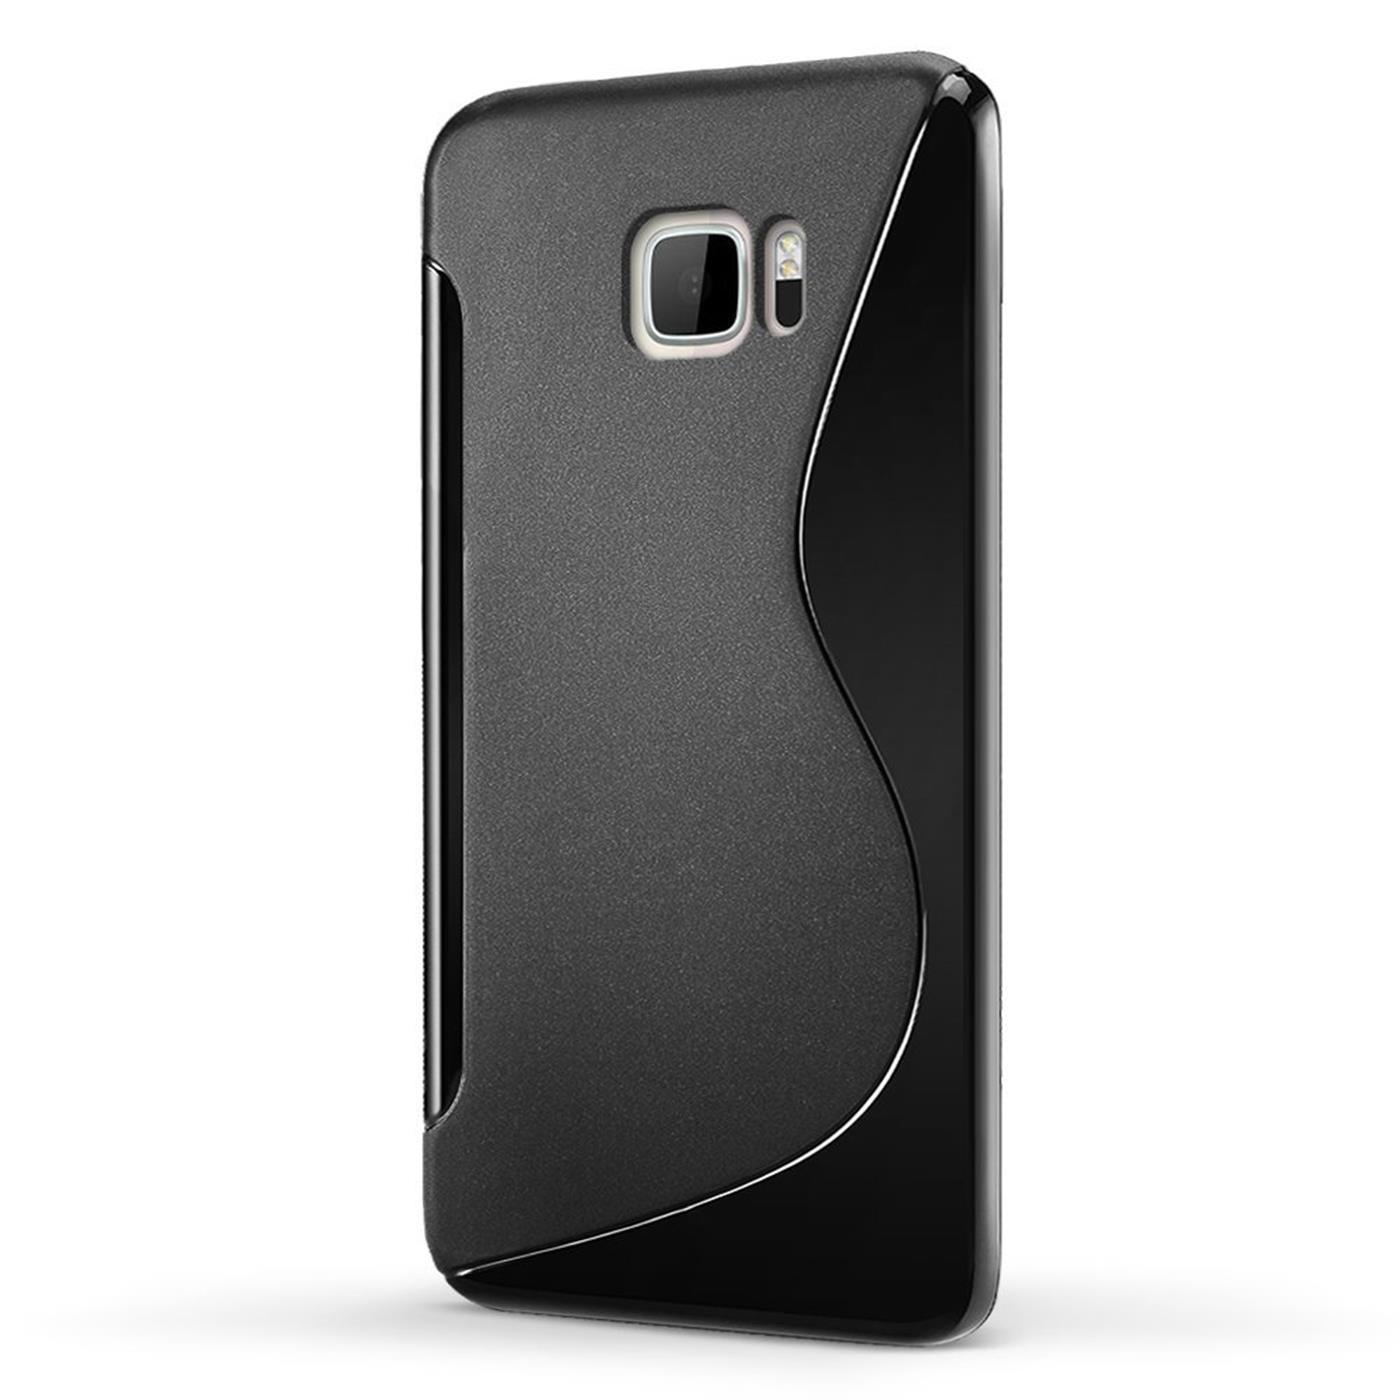 HTC-One-m9-Silikon-Gel-S-Line-Case-Cover-Ultra-Thin-Slim-Back-Bumper Indexbild 20